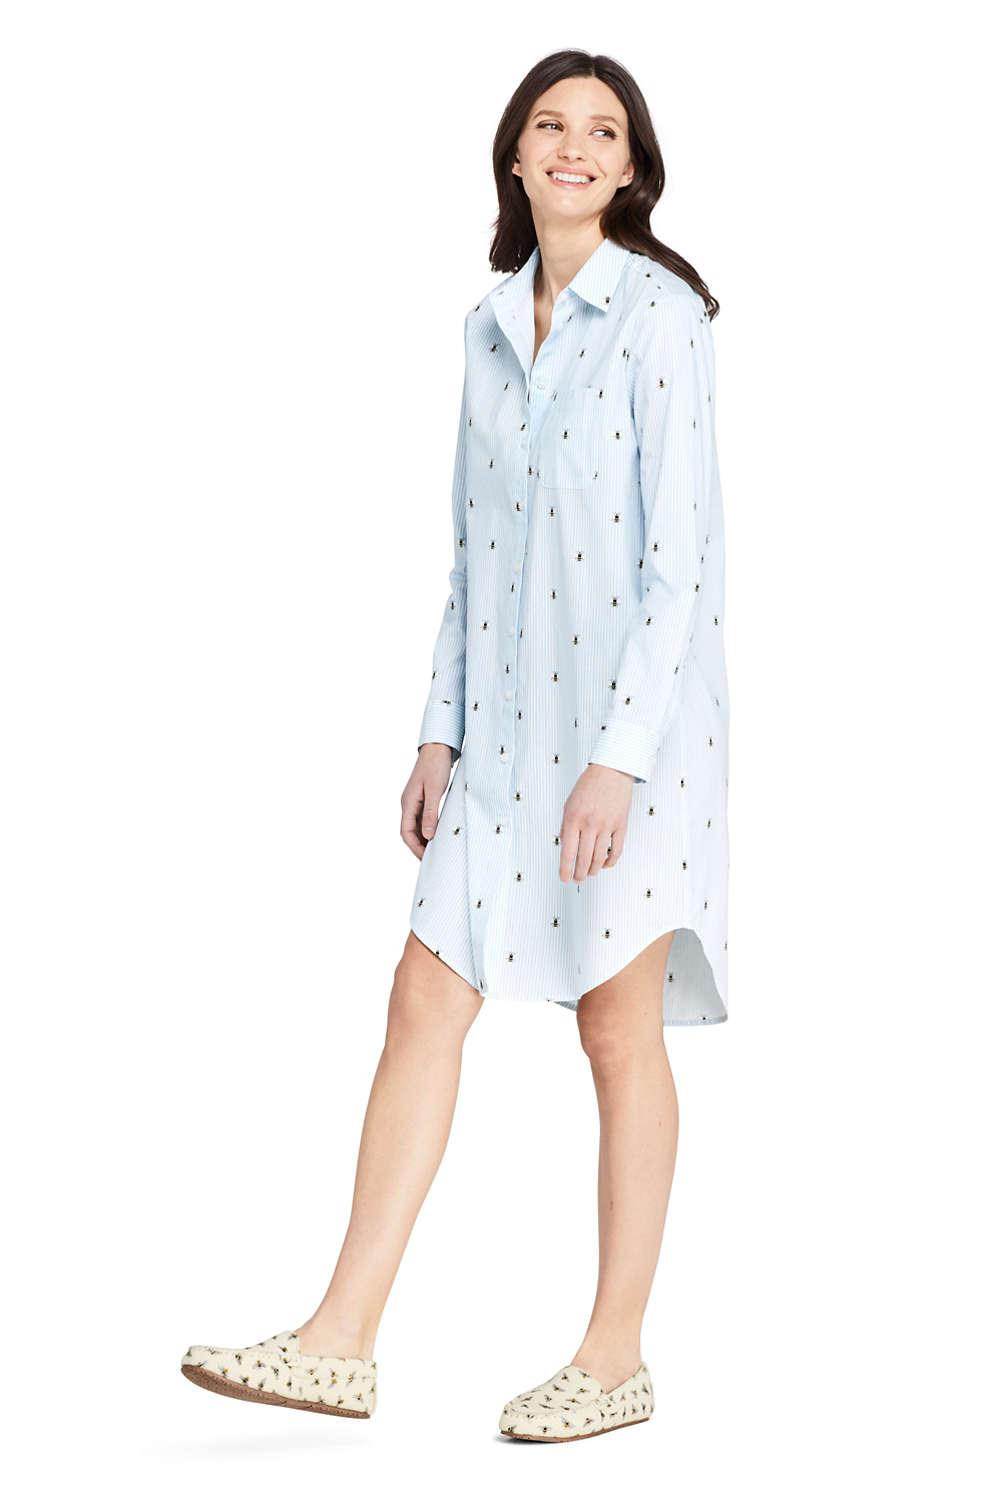 118651b5e3 Women s Cotton Pajama Nightshirt Sophie Allport Bee Print. Item  508660AH9.  View Fullscreen